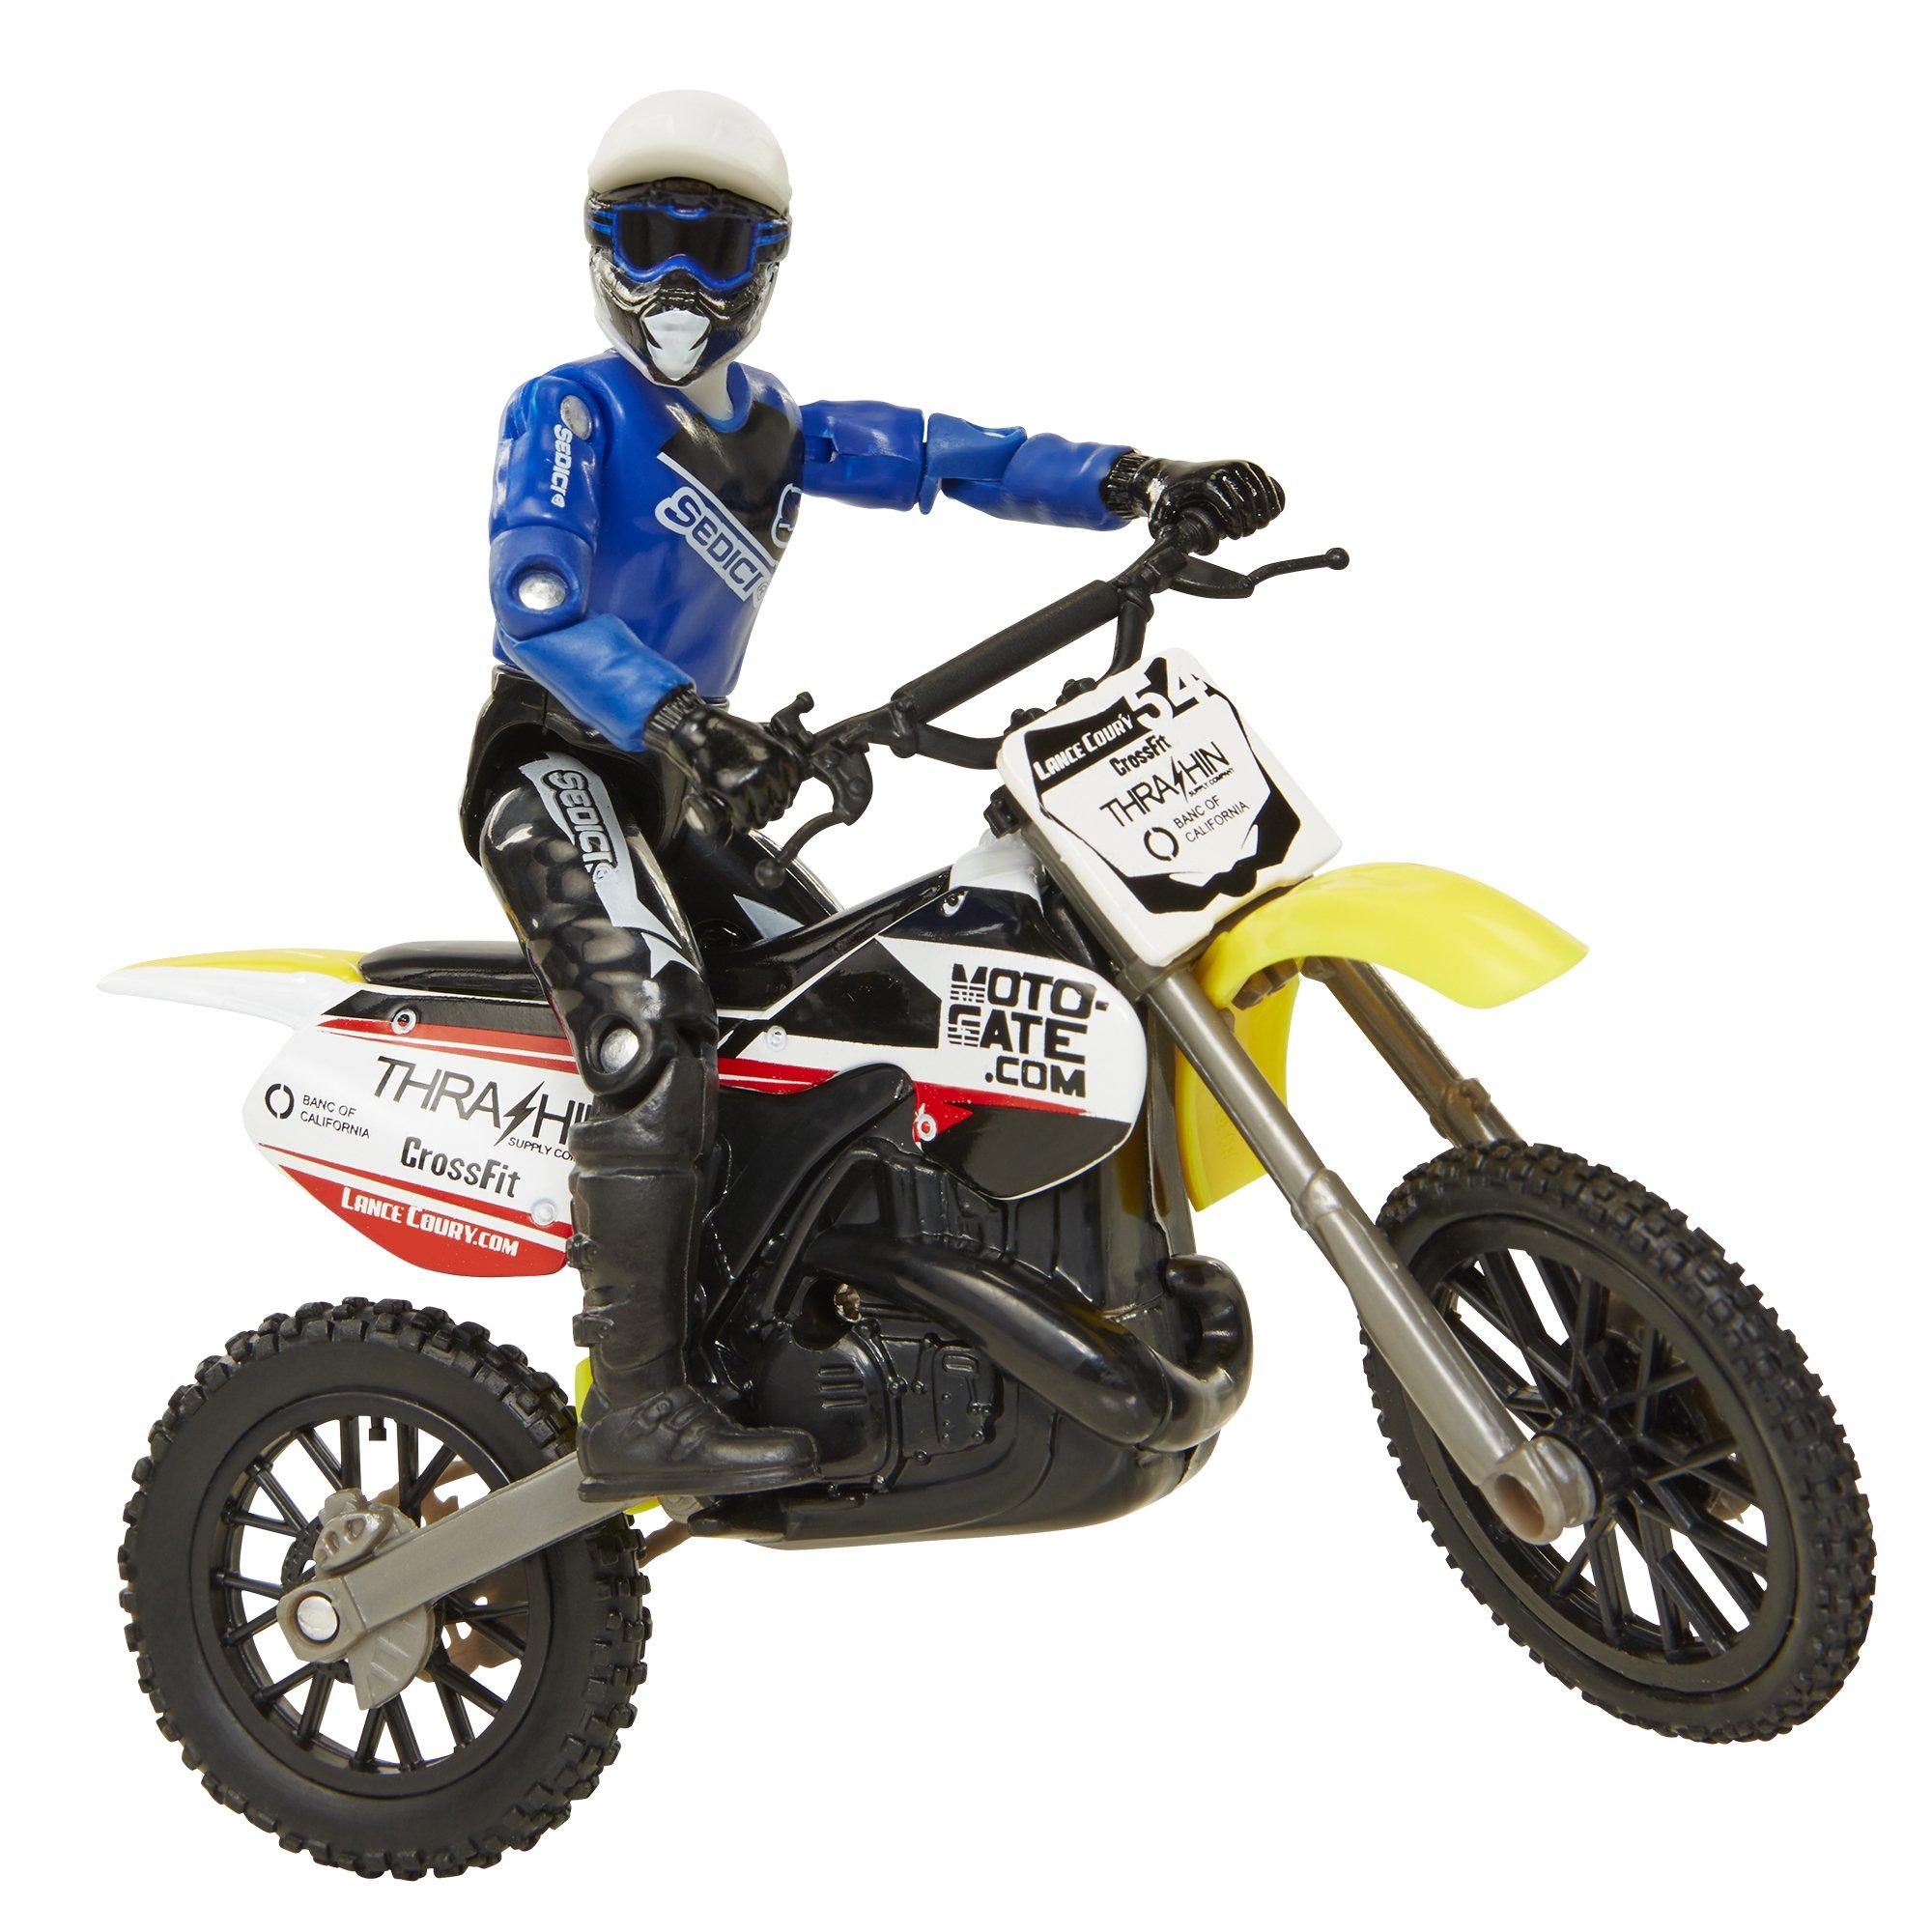 MXS Boys Lance Coury SFX Bike & Rider Set by MXS